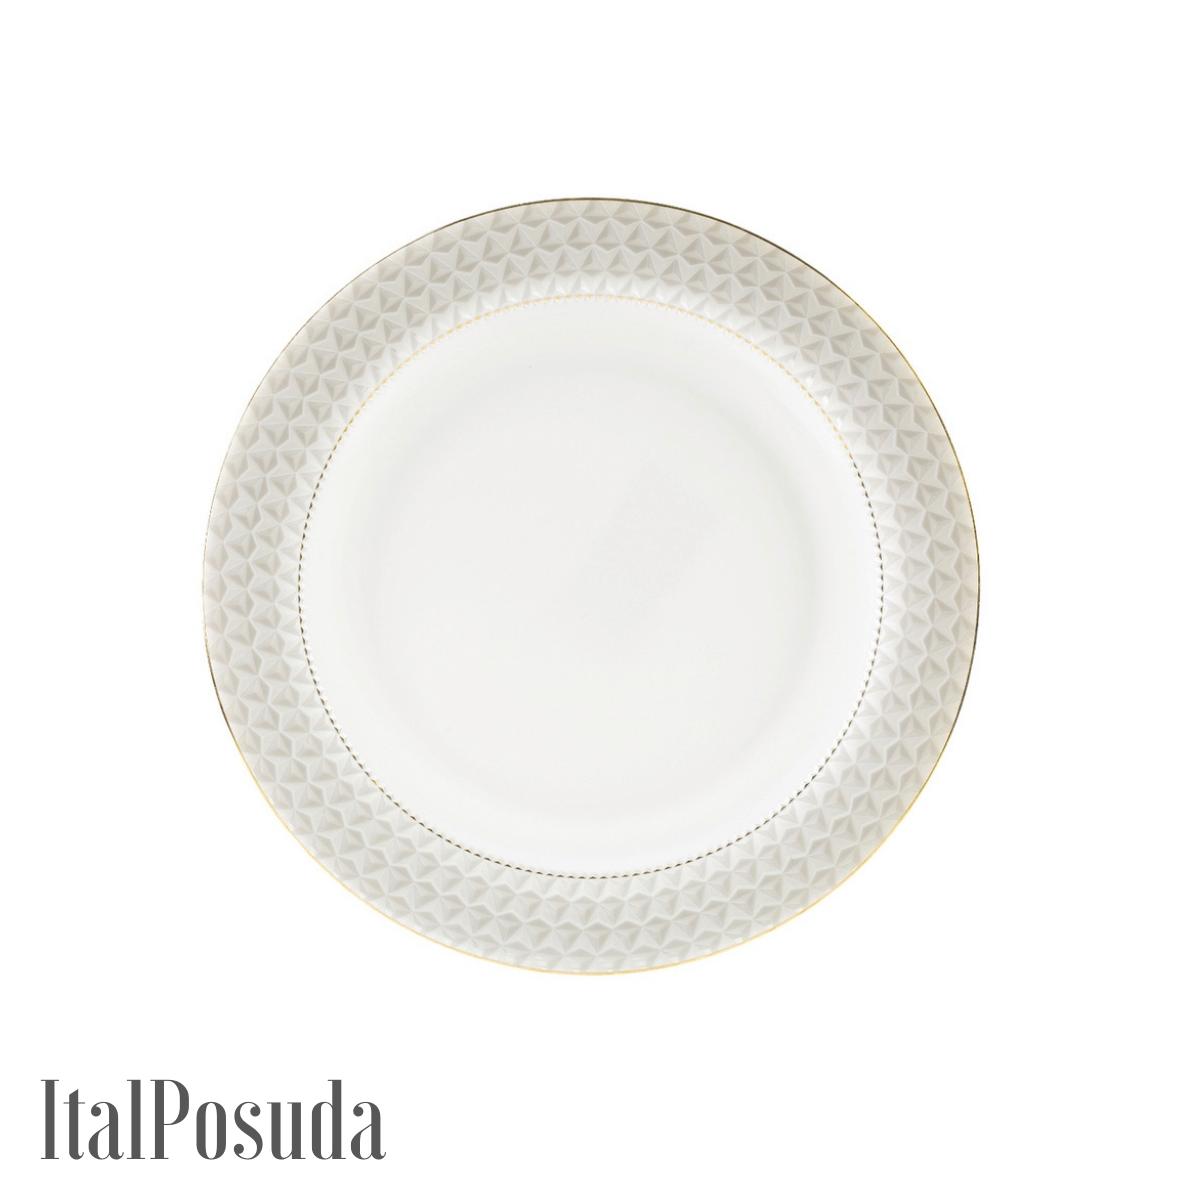 Тарелка обеденная 27 см